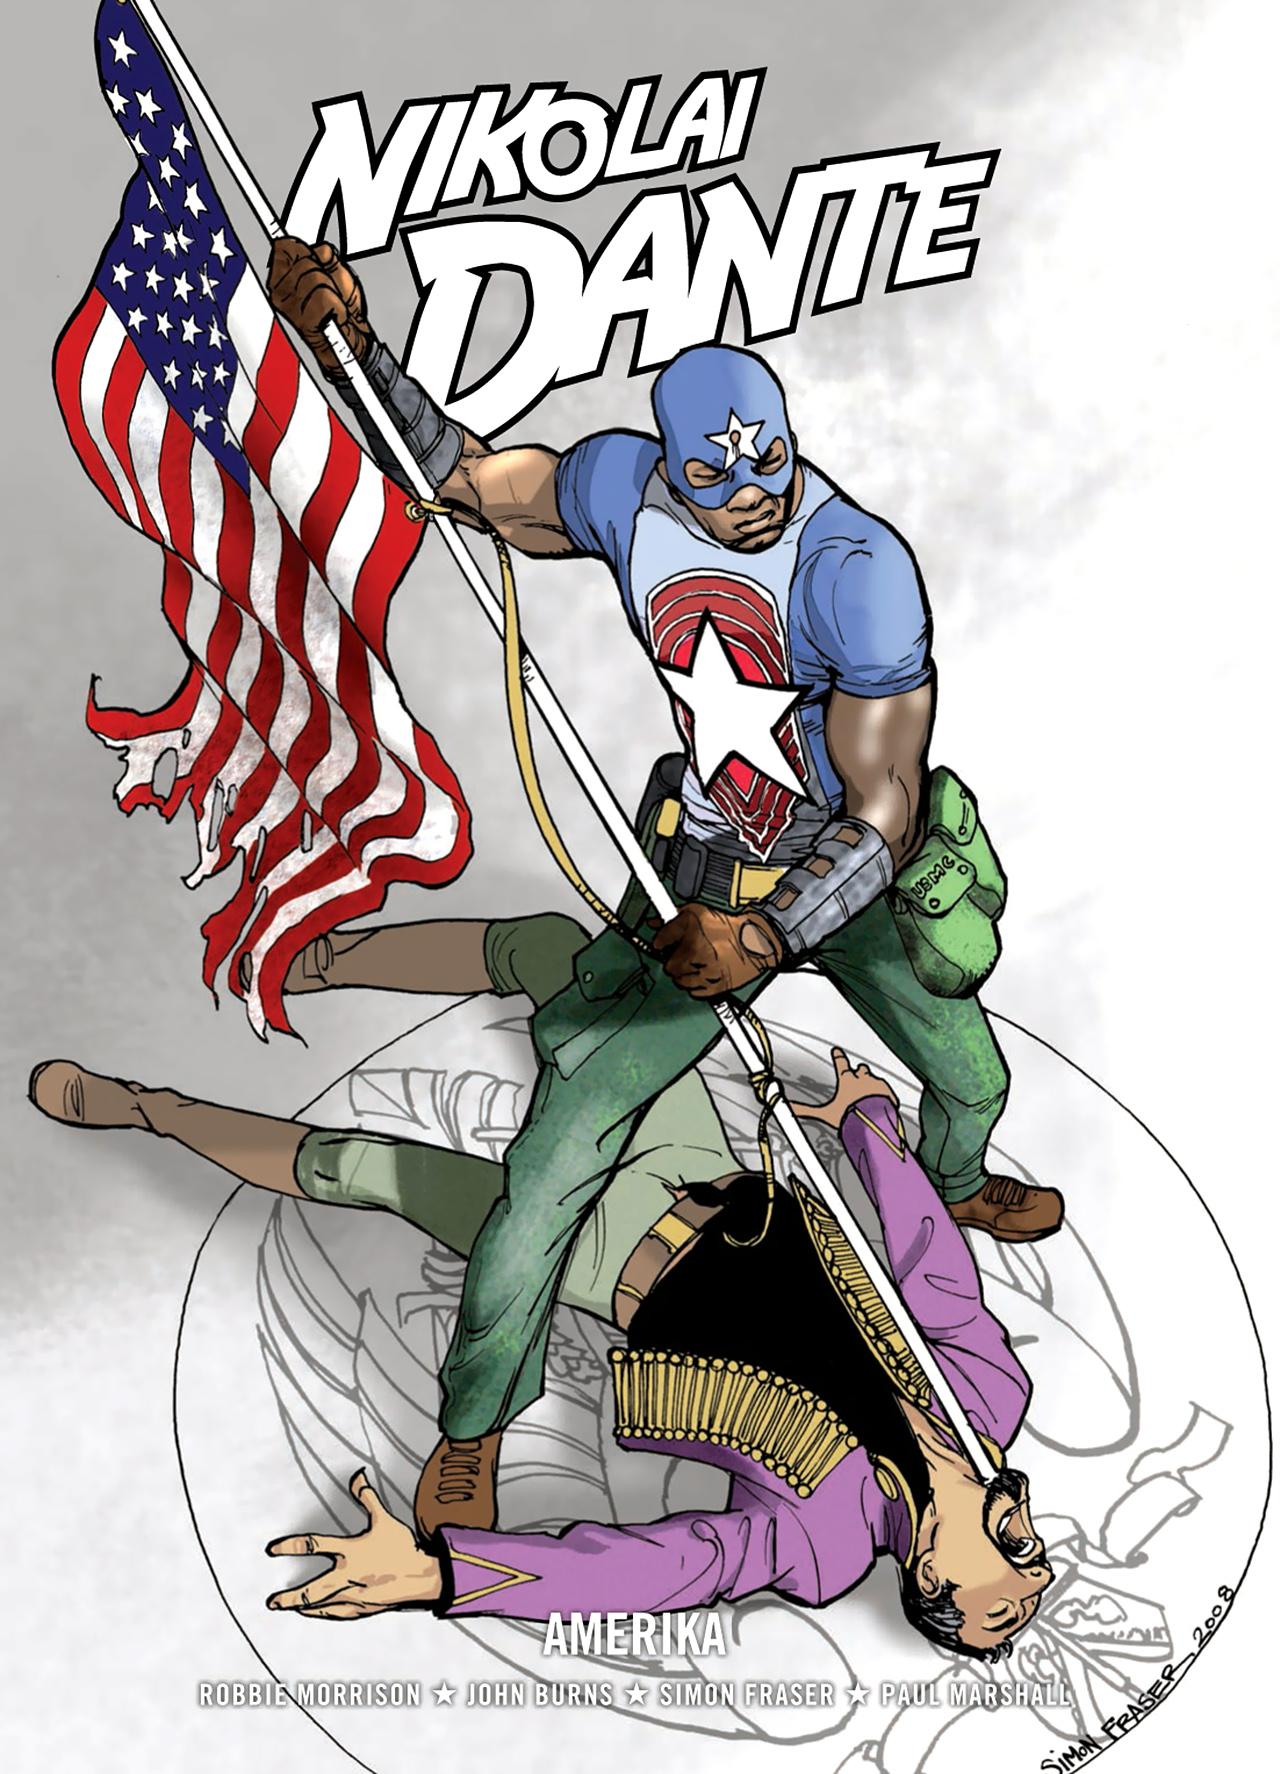 Read online Nikolai Dante comic -  Issue # TPB 9 - 1